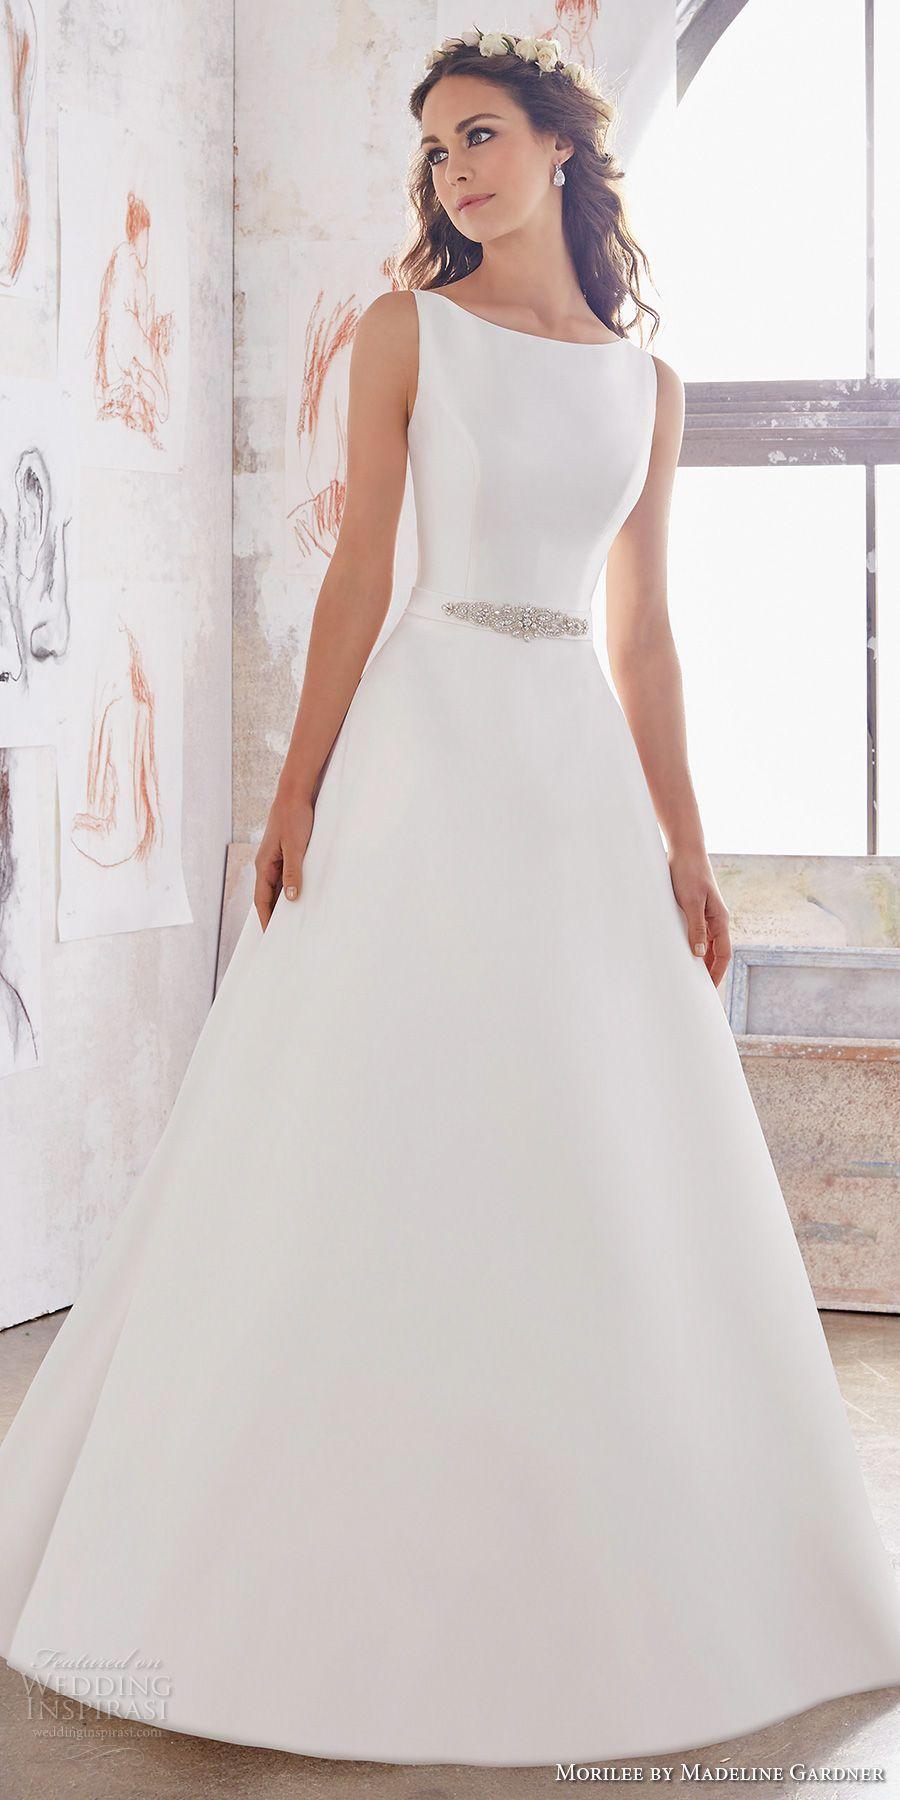 Morilee spring bridal sleeveless bateau neckline simple clean